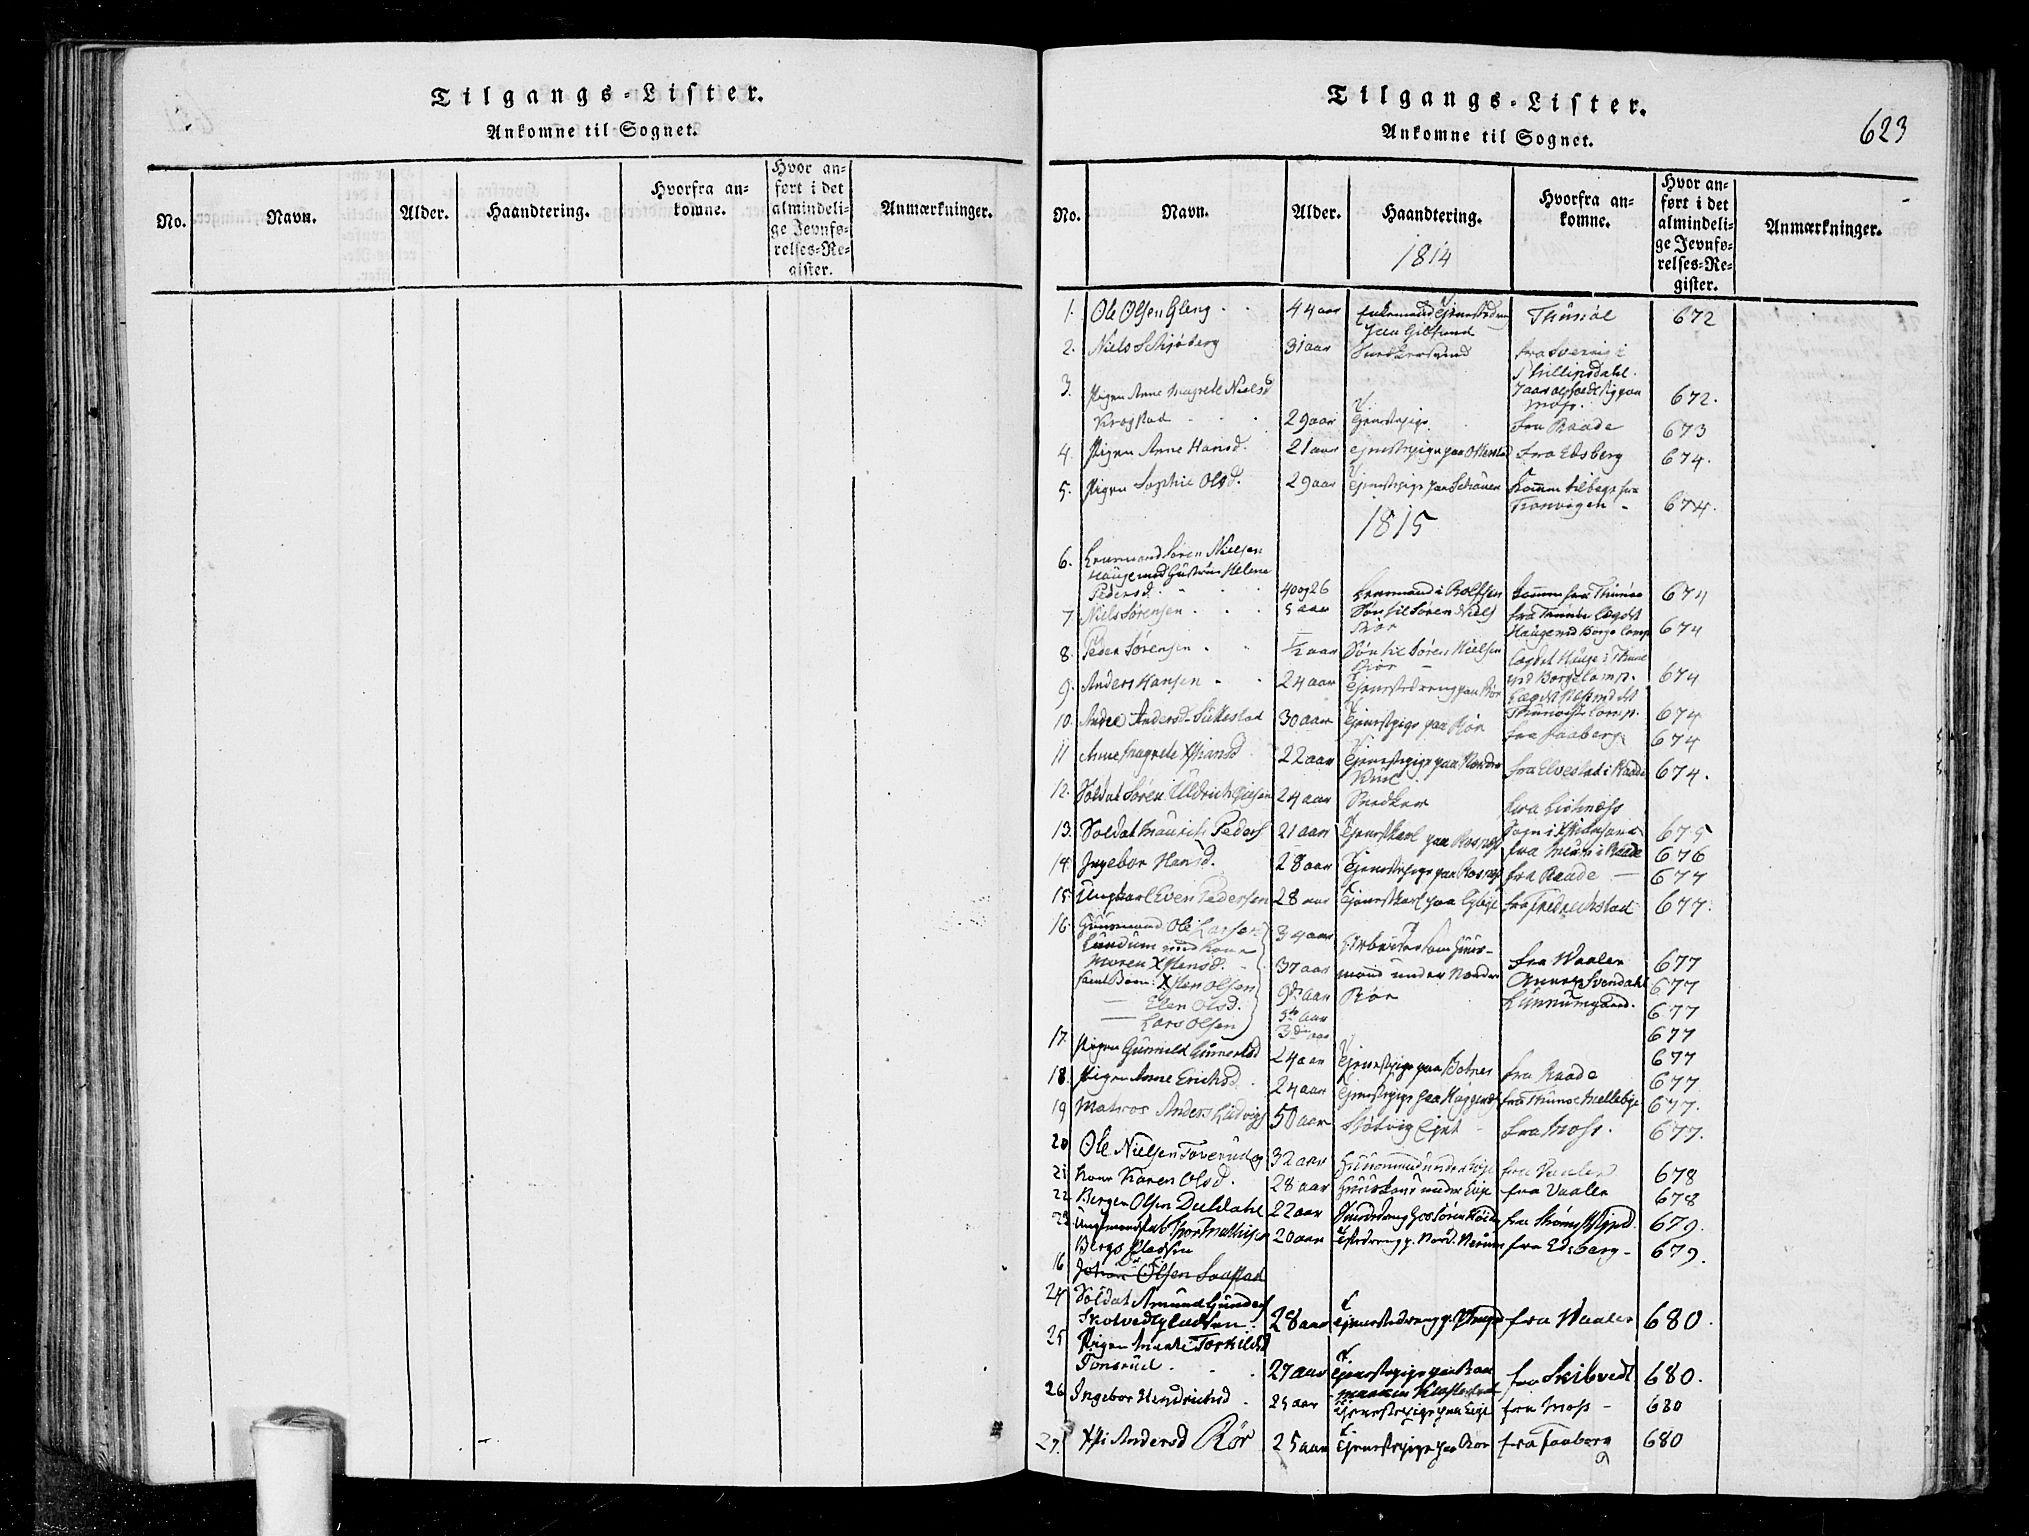 SAO, Rygge prestekontor Kirkebøker, G/Ga/L0001: Klokkerbok nr. 1, 1814-1871, s. 622-623